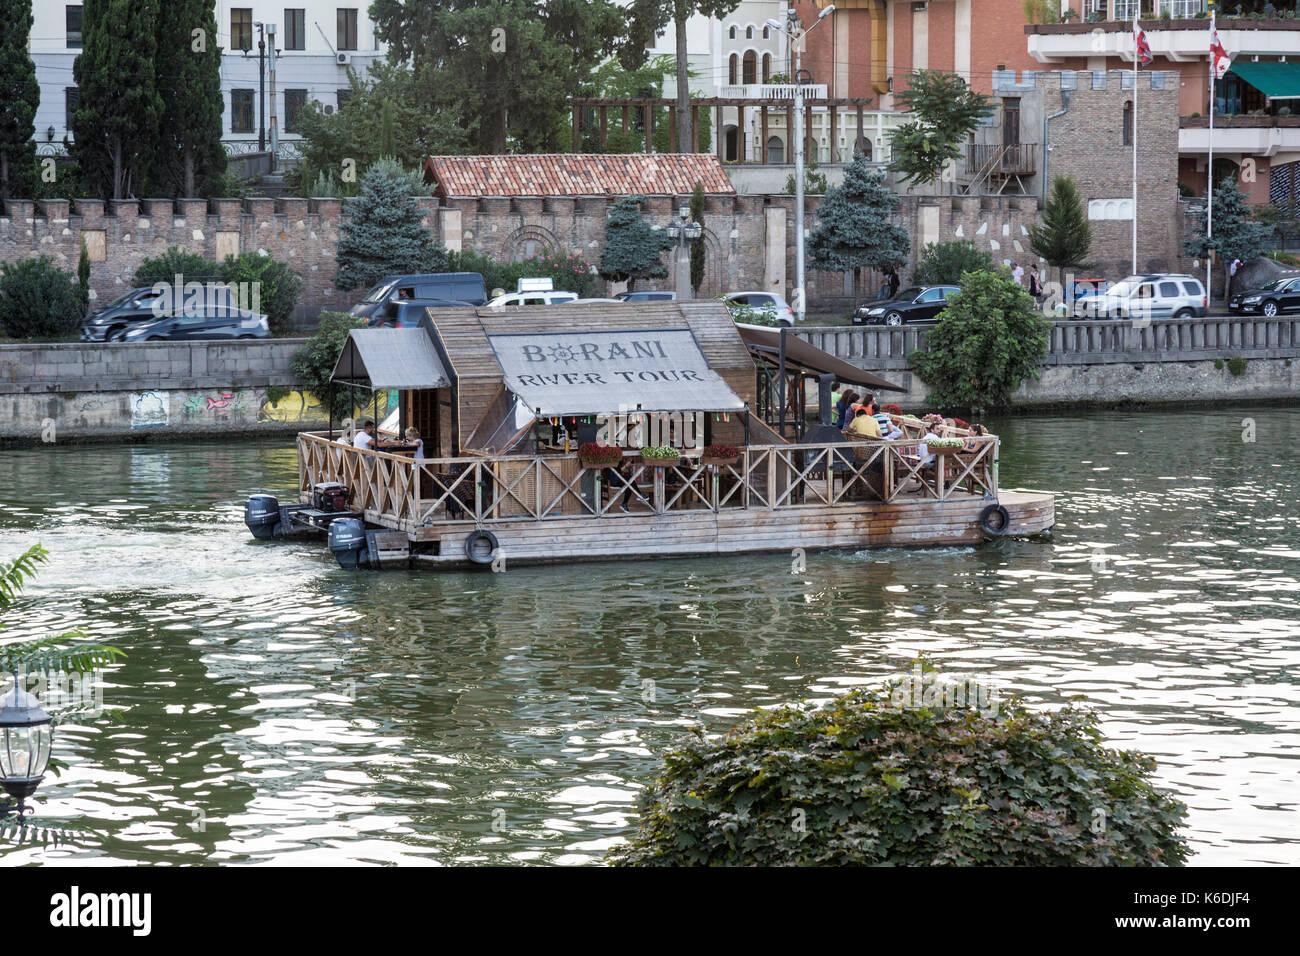 Tourist boat cruising on the Kura River in the centre of Tbilisi in Georgia. - Stock Image